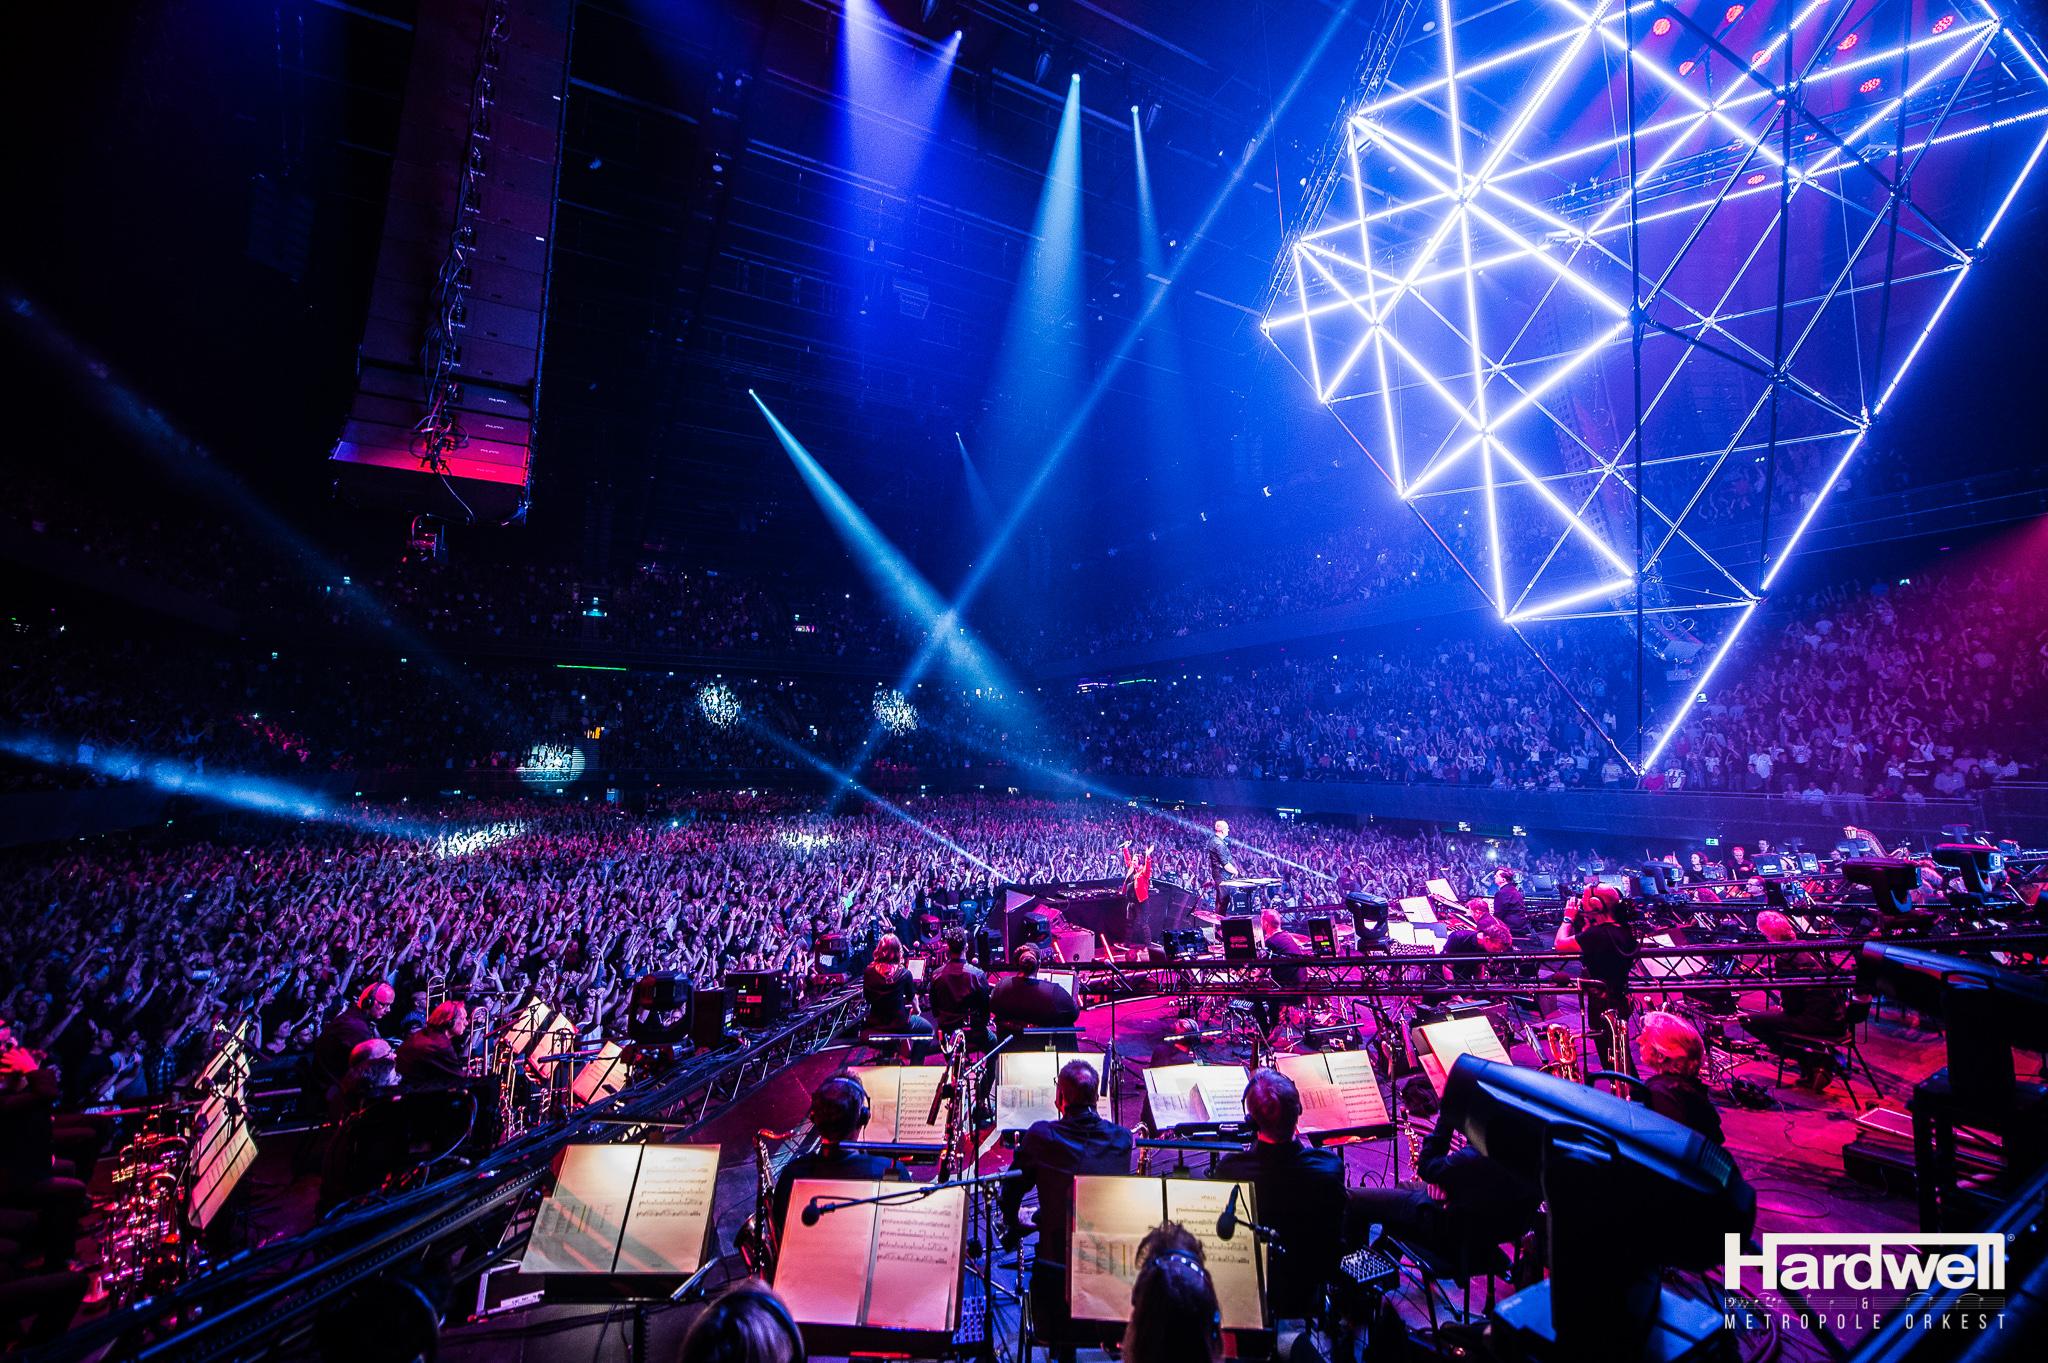 Hardwell x Metropole Orchestra